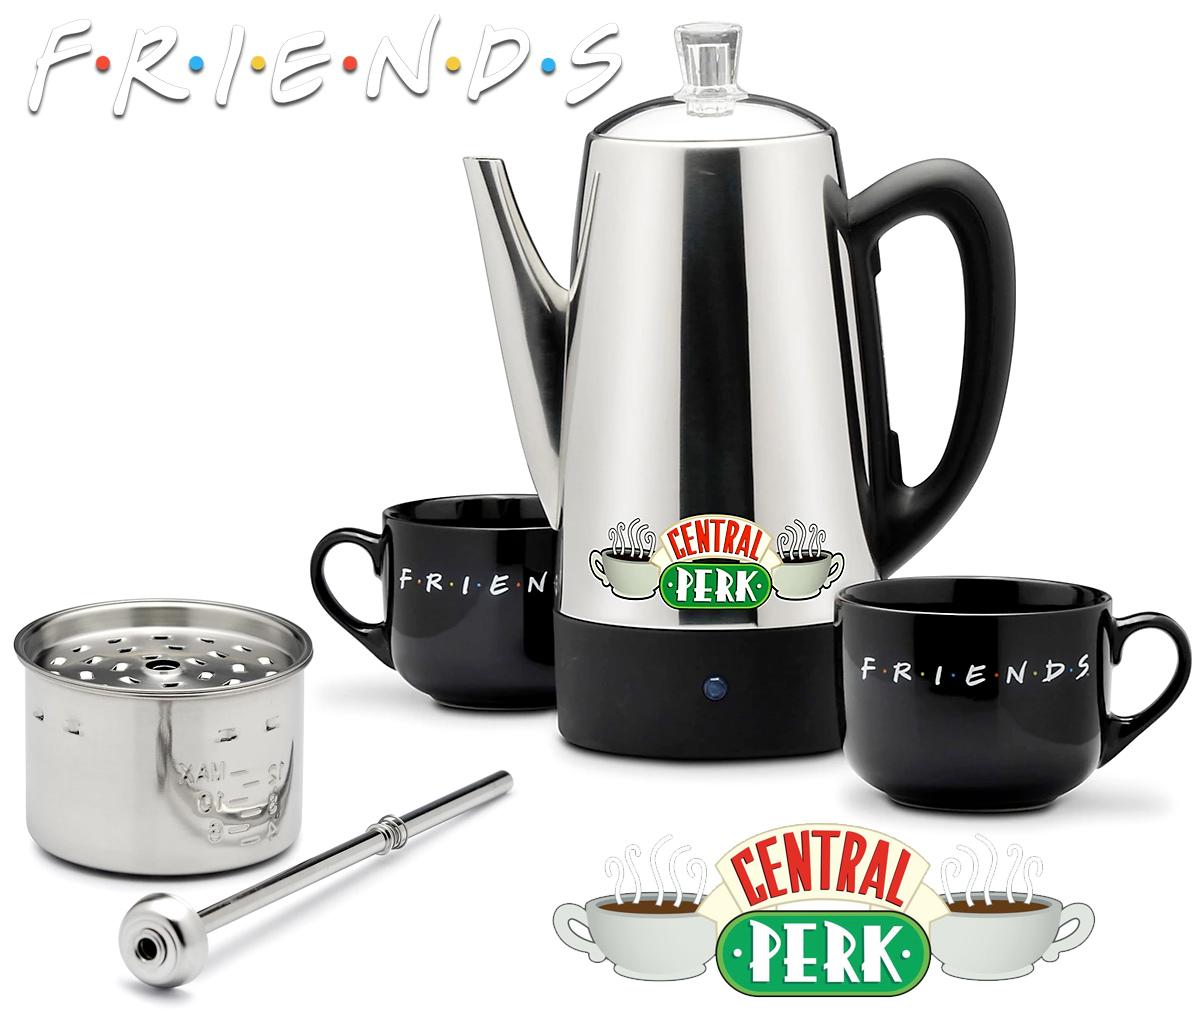 Cafeteira Elétrica Friends Central Perk